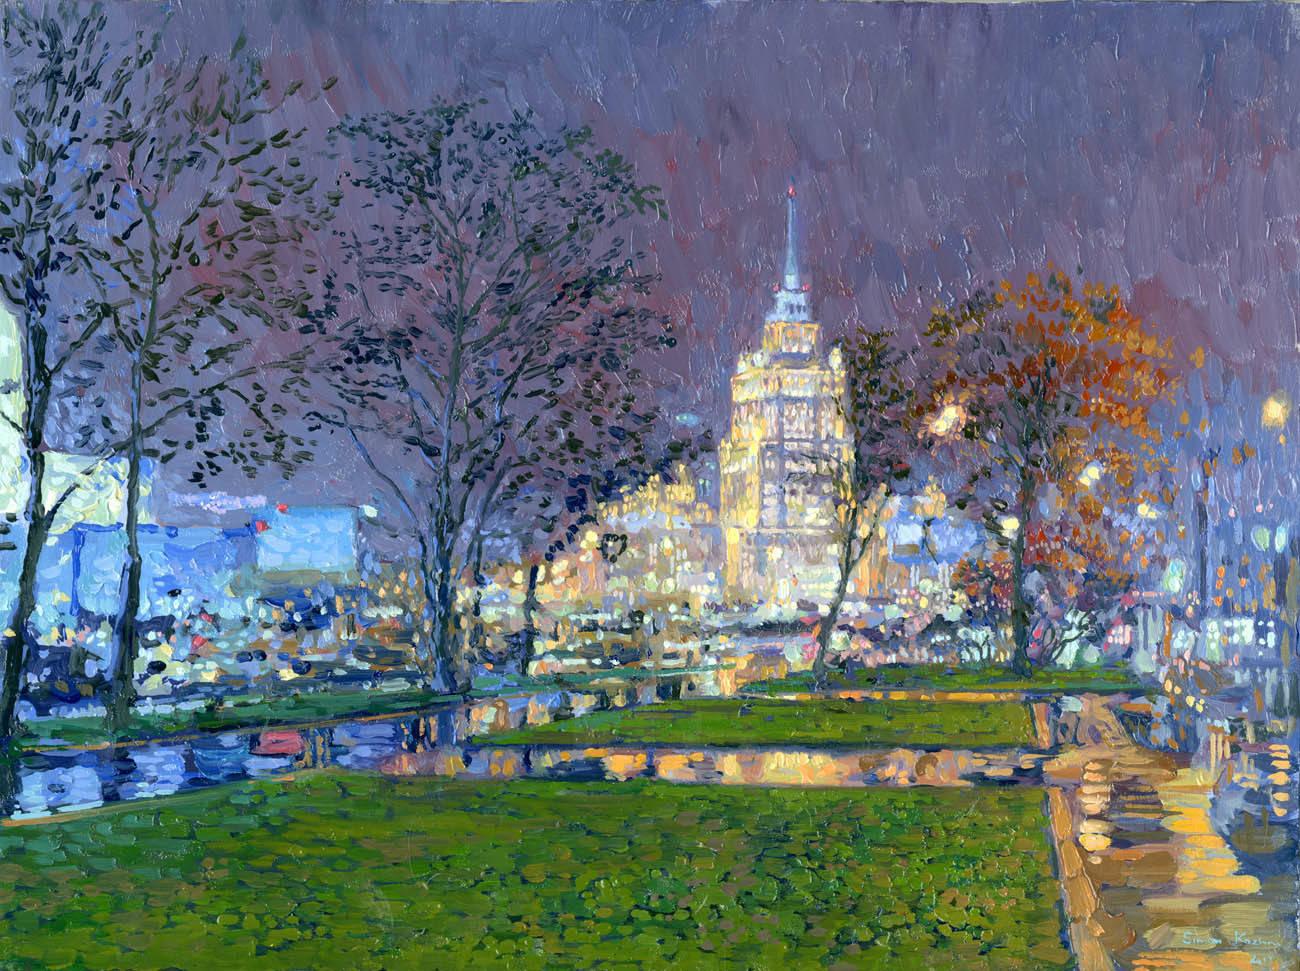 Night Moscow. Ukraina Hotel. Of 2013. Oil on canvas. 30 x 40 cm